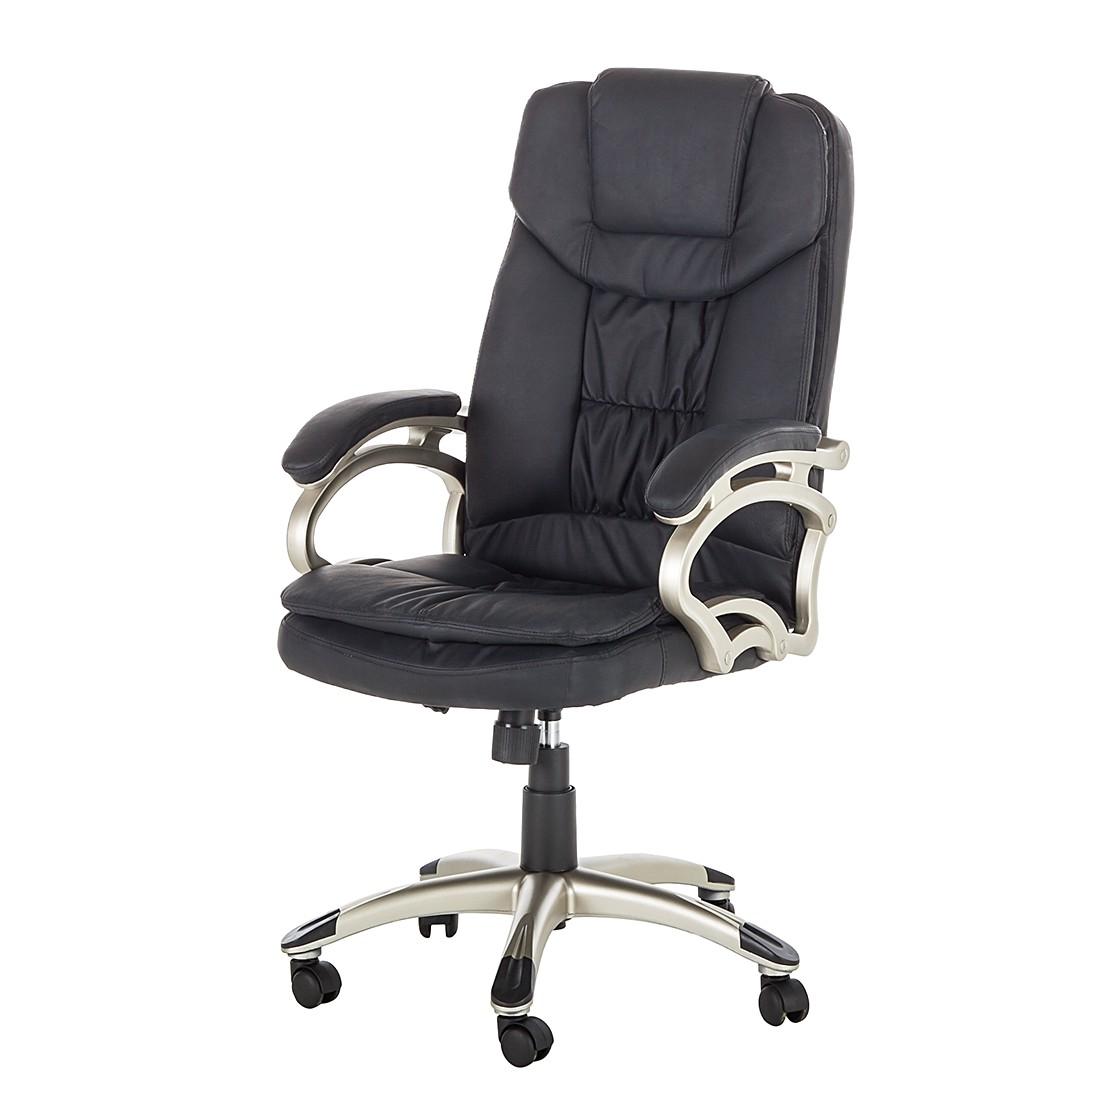 Chaise guide d 39 achat for Recherche chaises